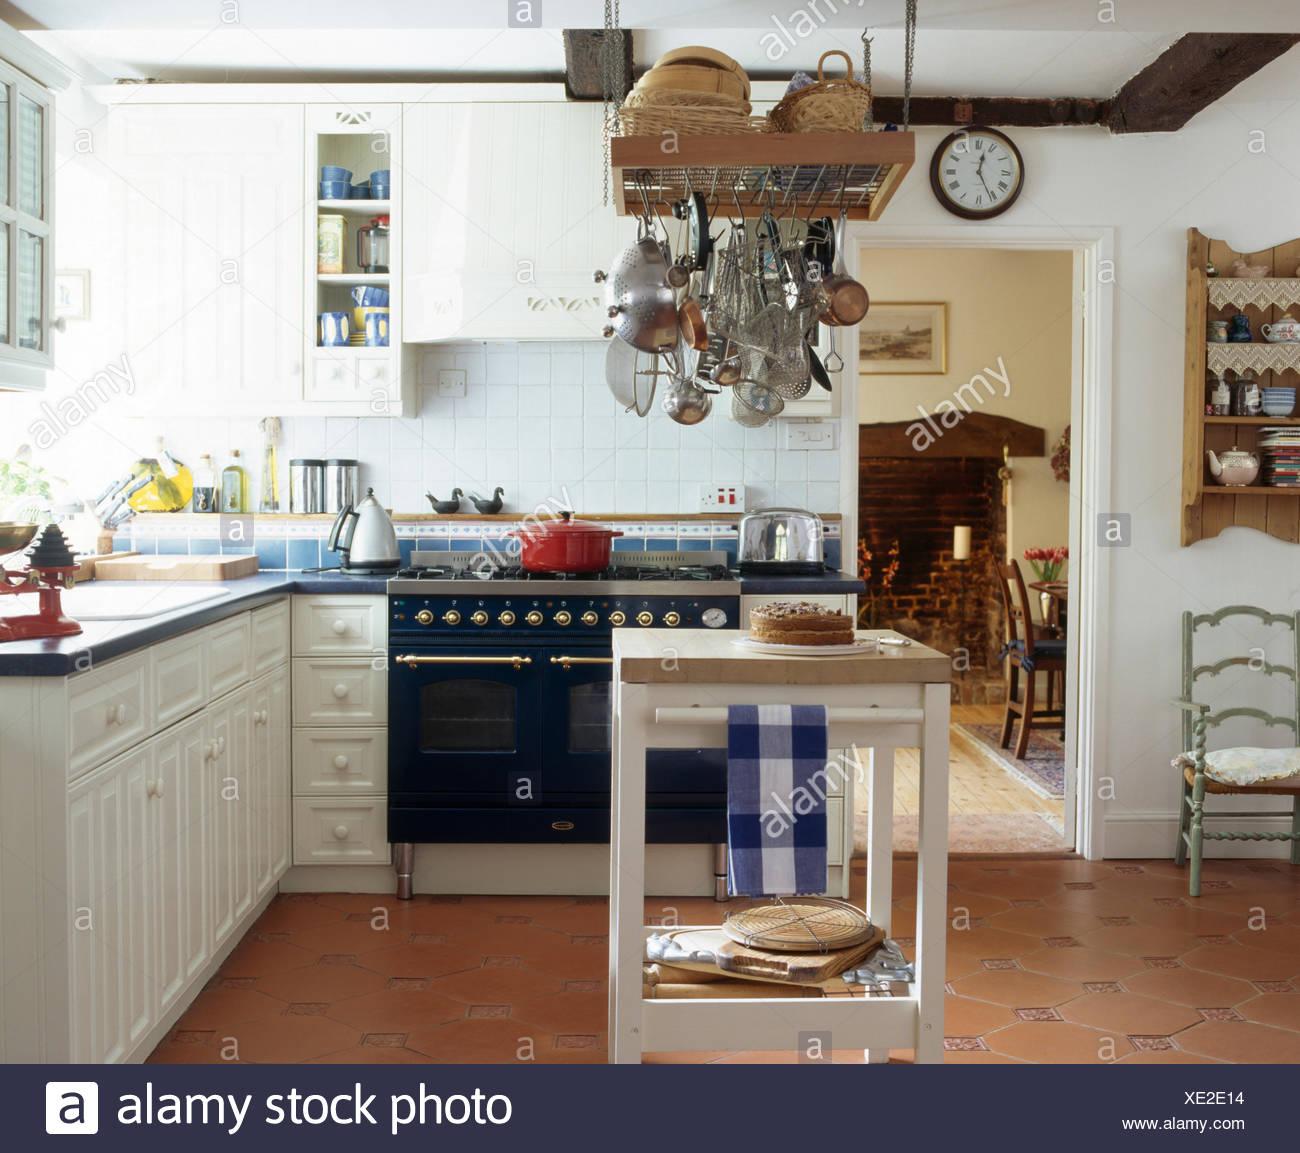 Fantástico Cocina Isla Bloque De Carnicero Viñeta - Ideas de ...